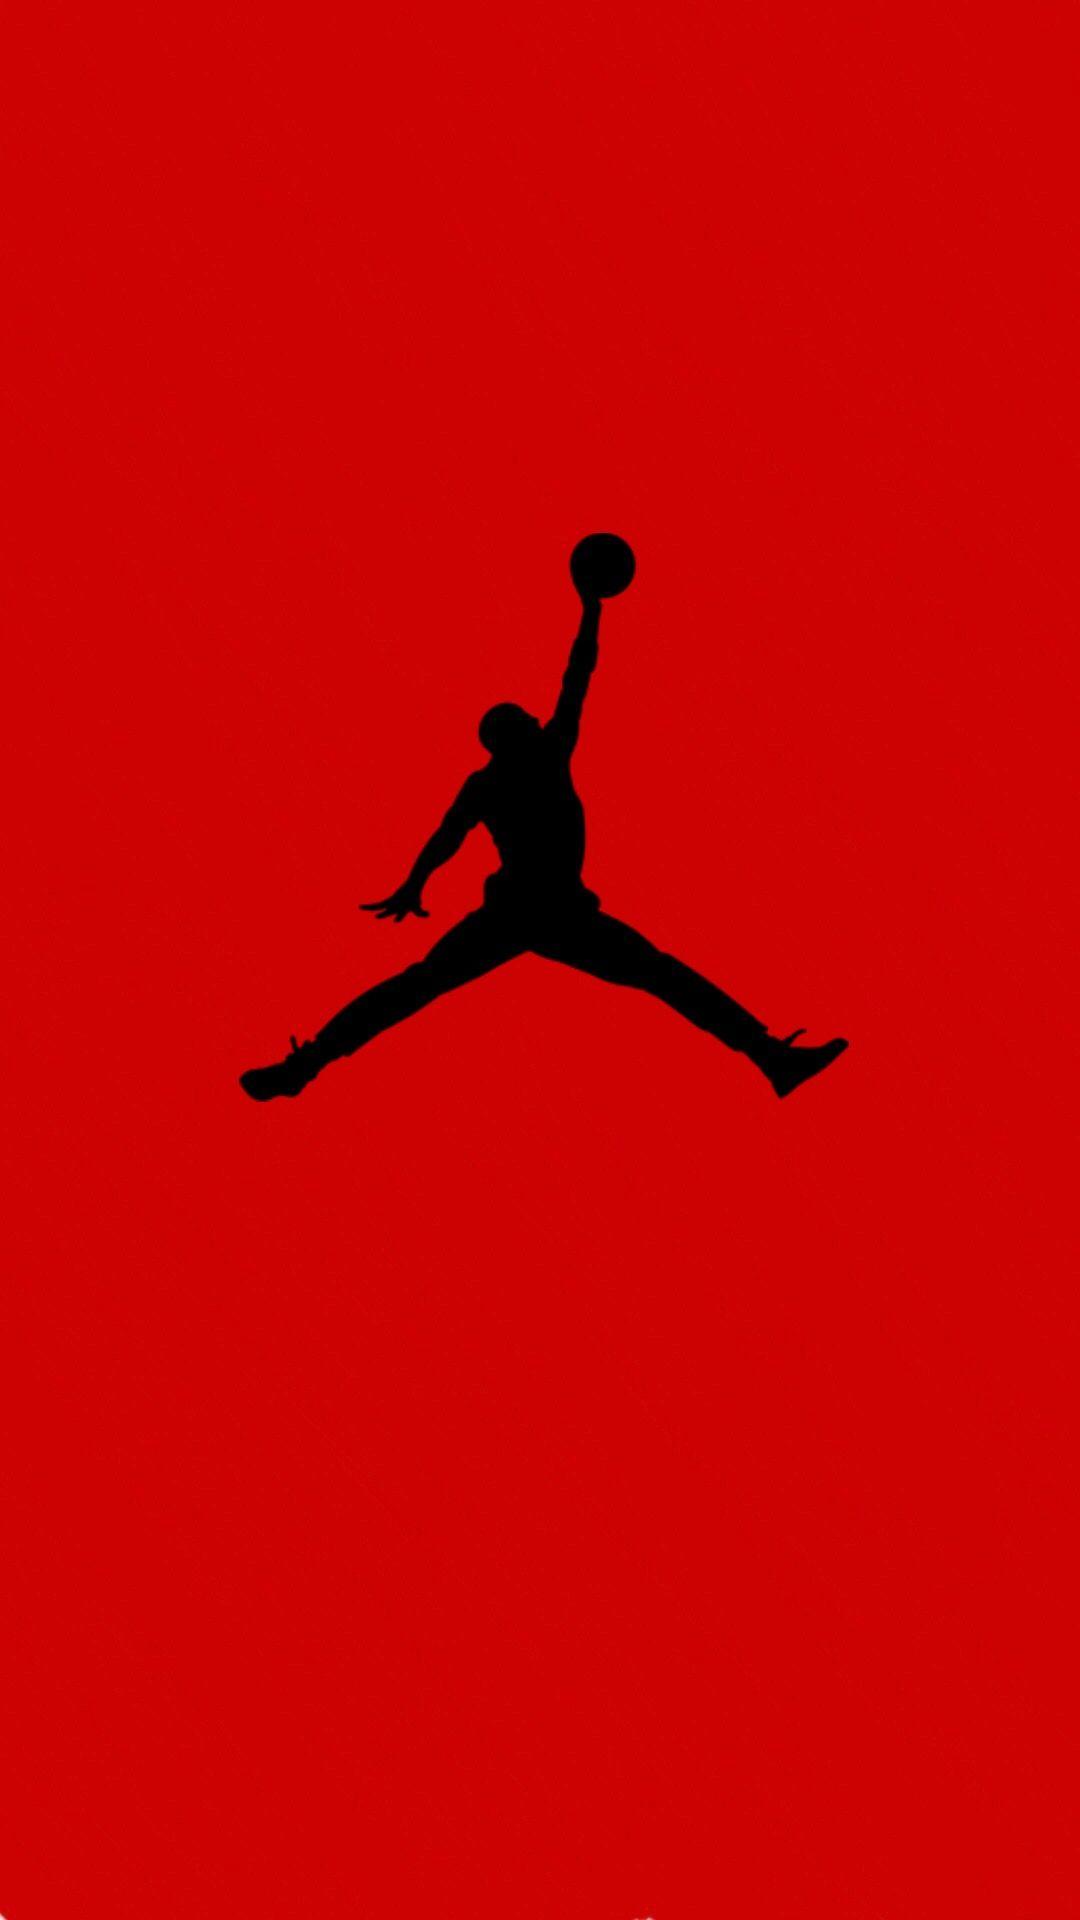 Air jordan logo iphone background en 2019.